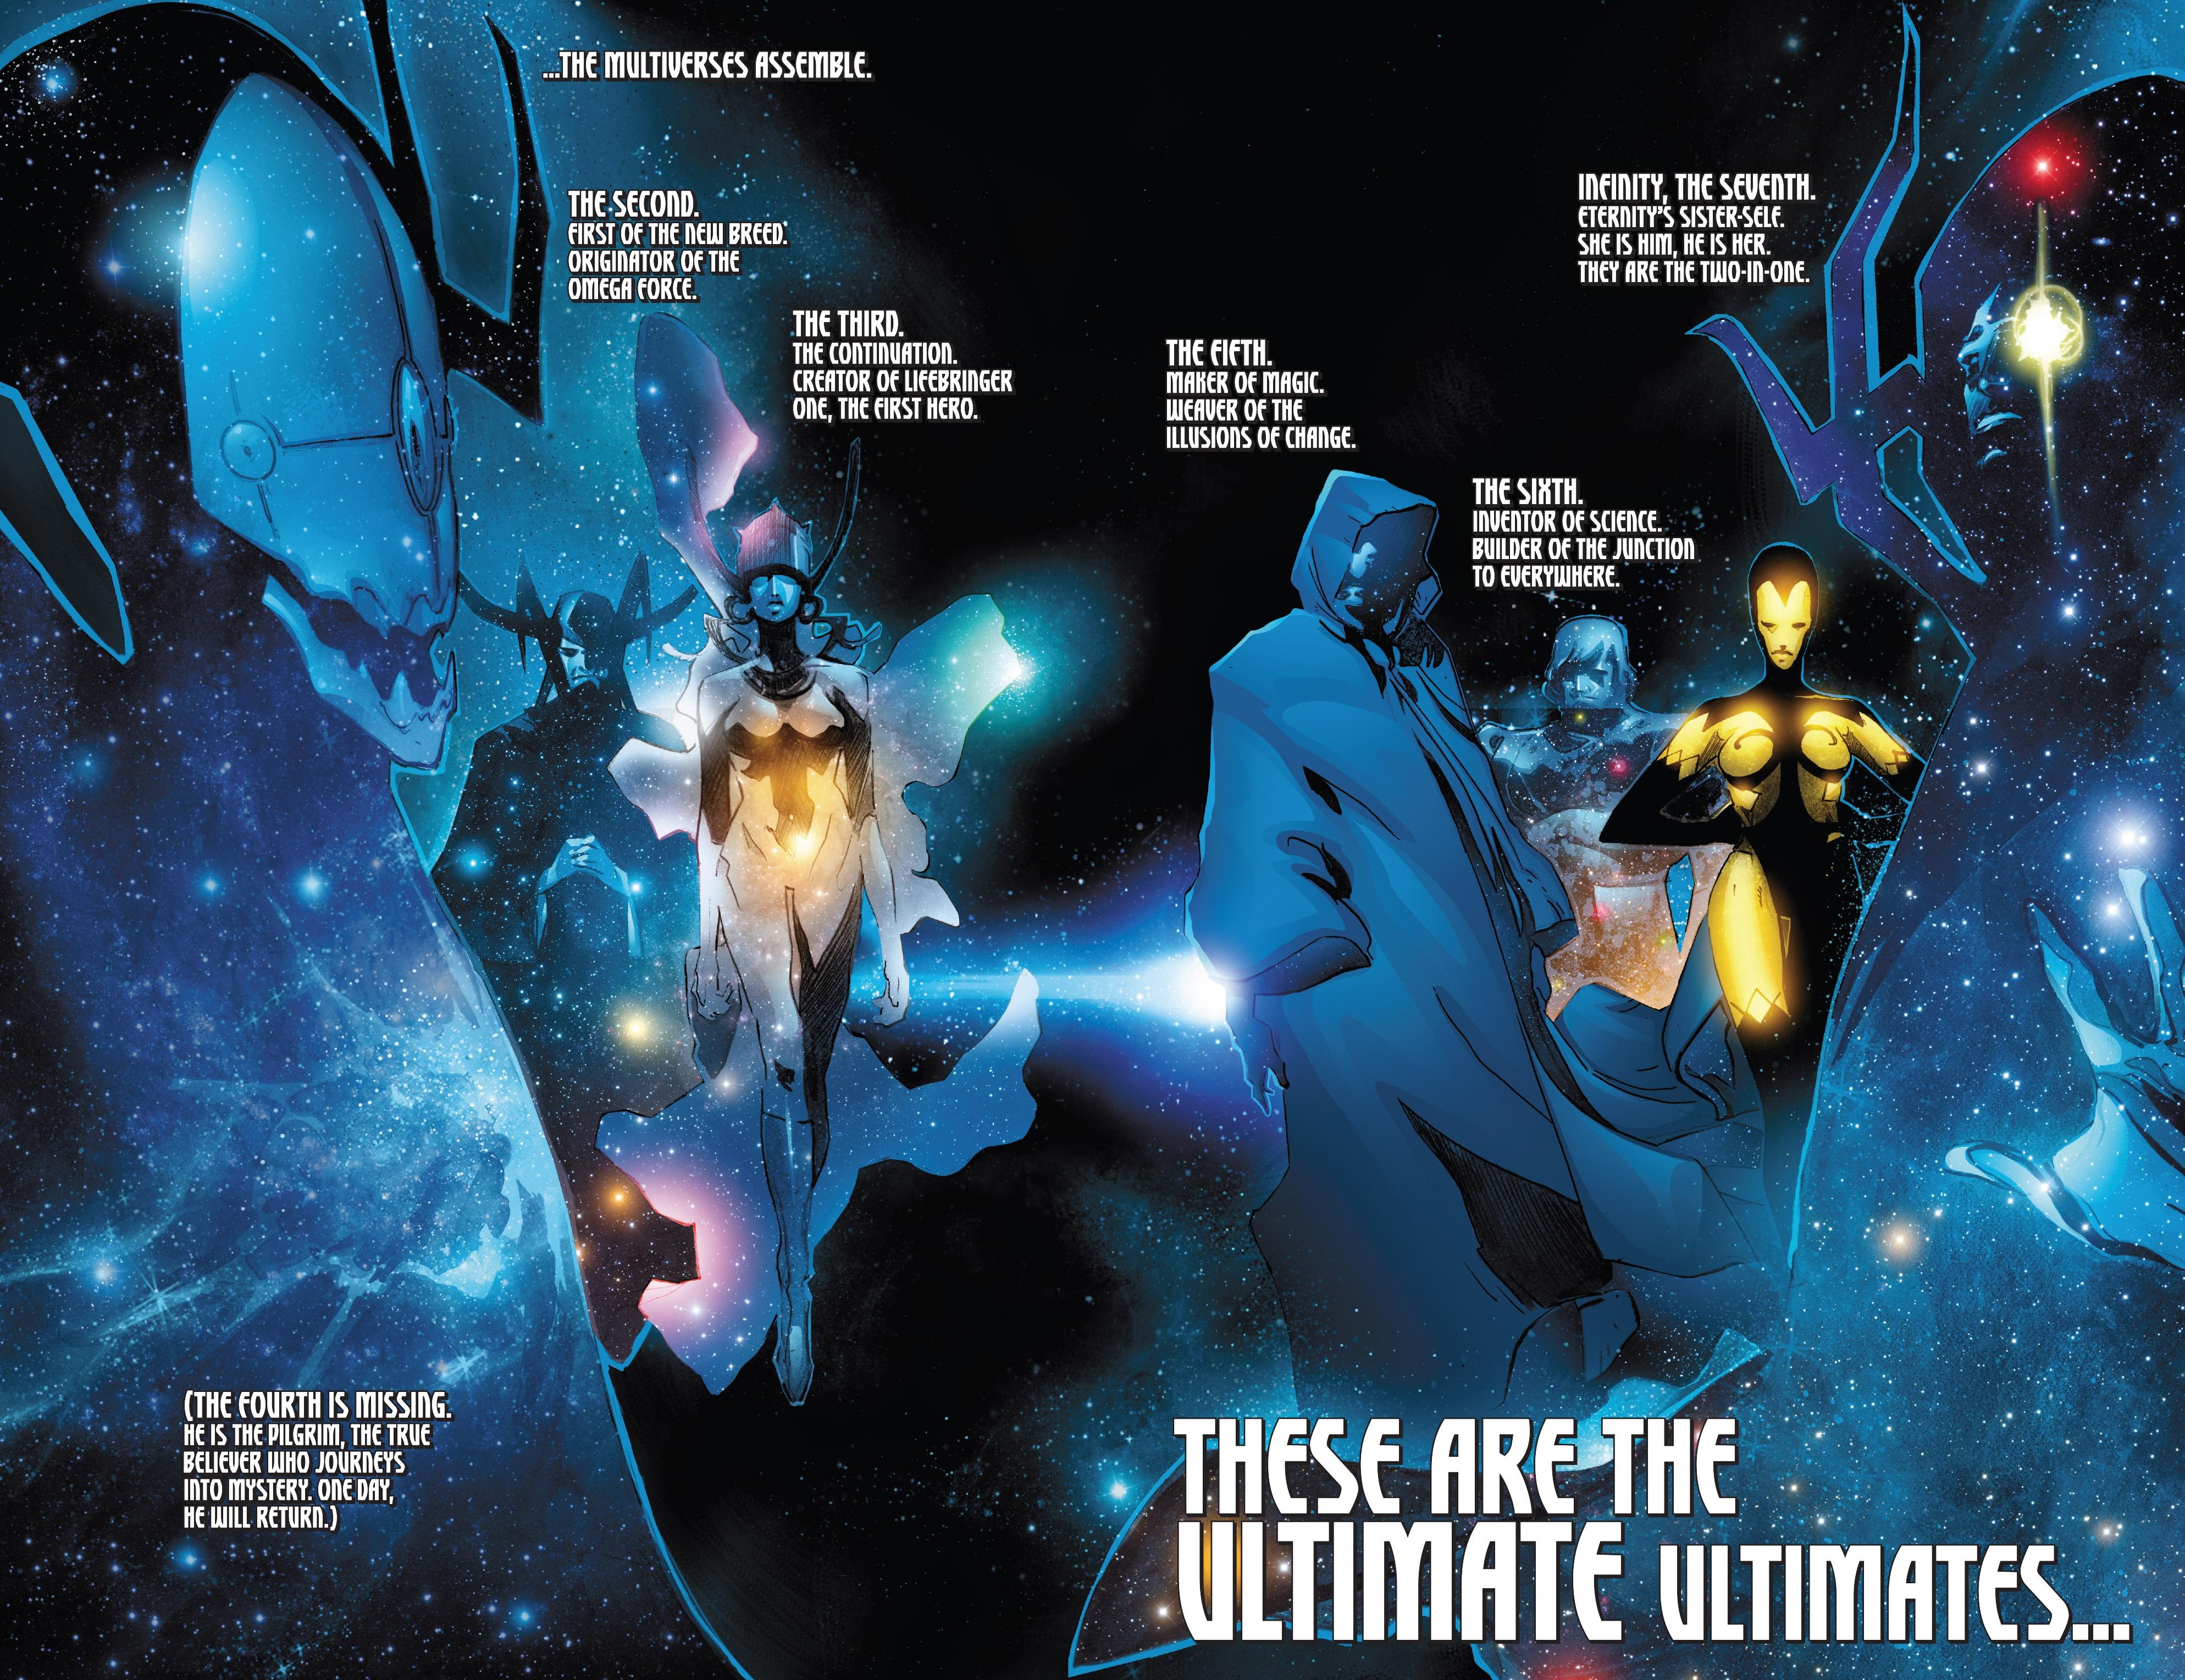 Ultimates (Multiverse)